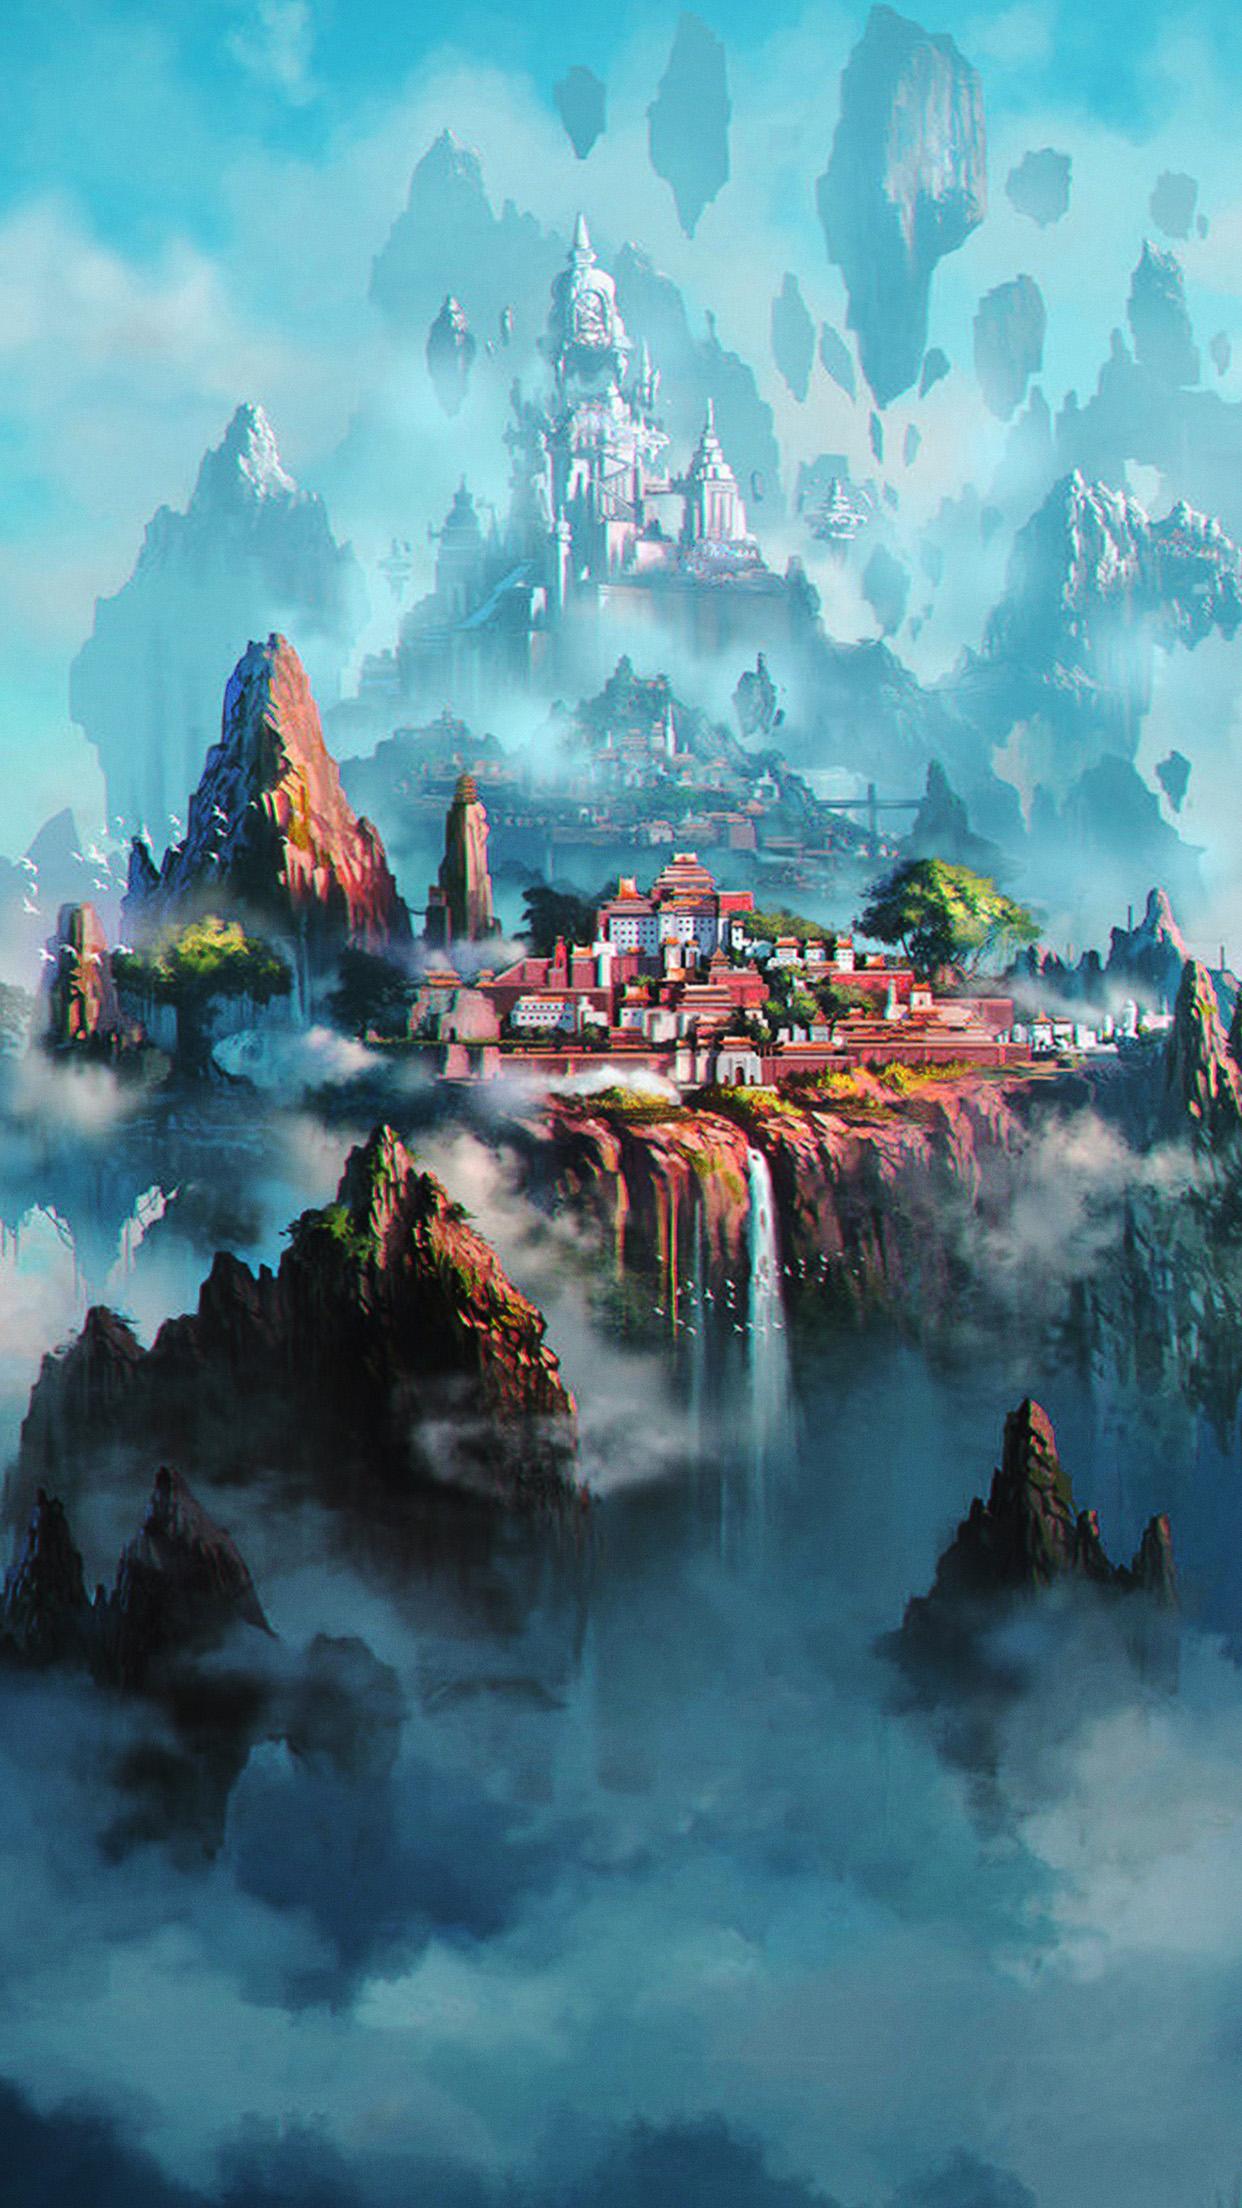 Iphone Wallpaper Cloud Av36 Cloud Town Fantasy Anime Liang Xing Illustration Art